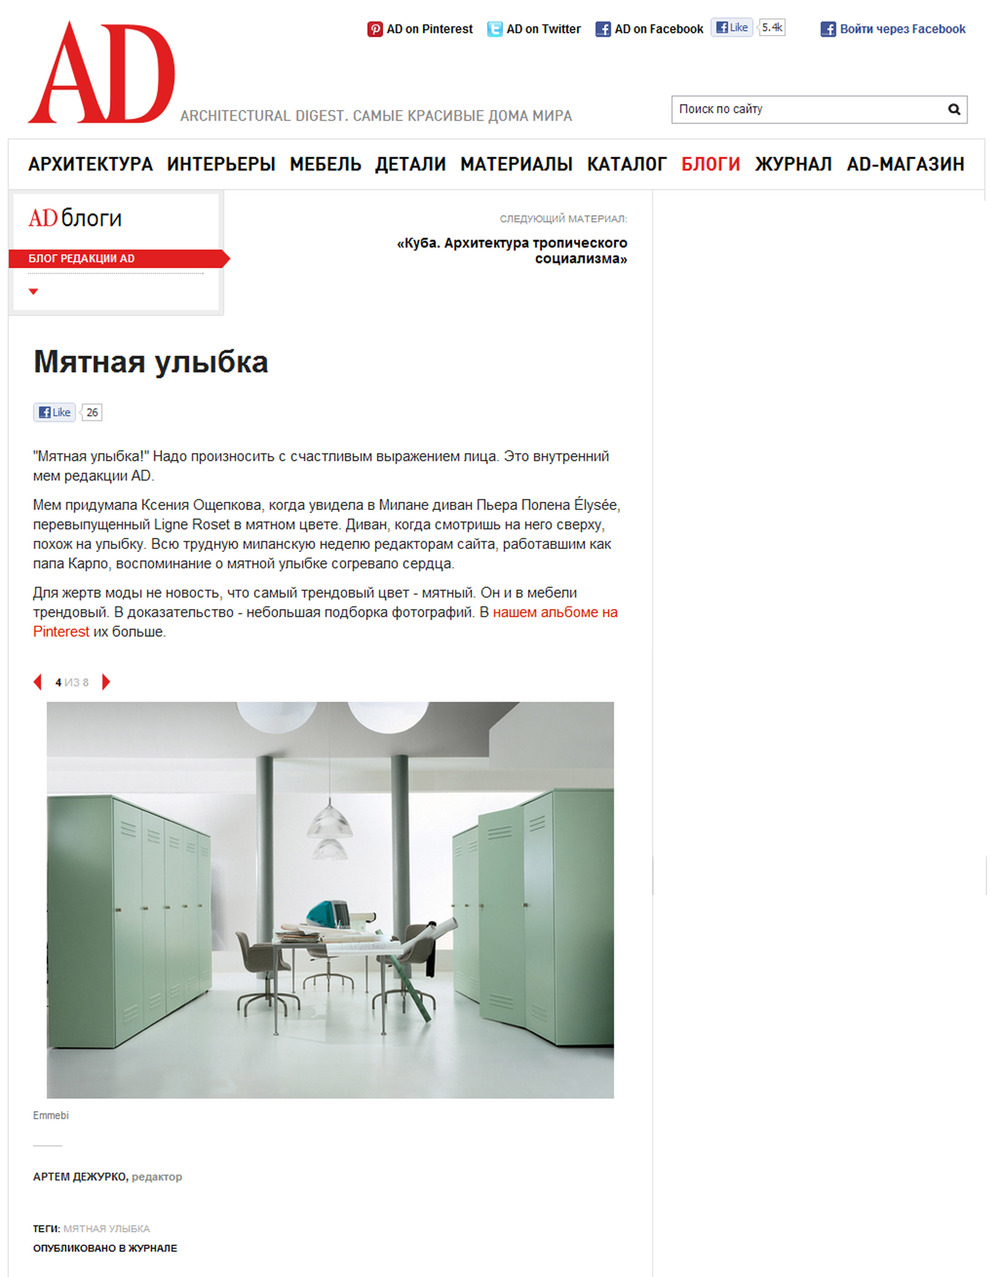 www.admagazine.ru 10 Settembre 2012 Russia.jpg